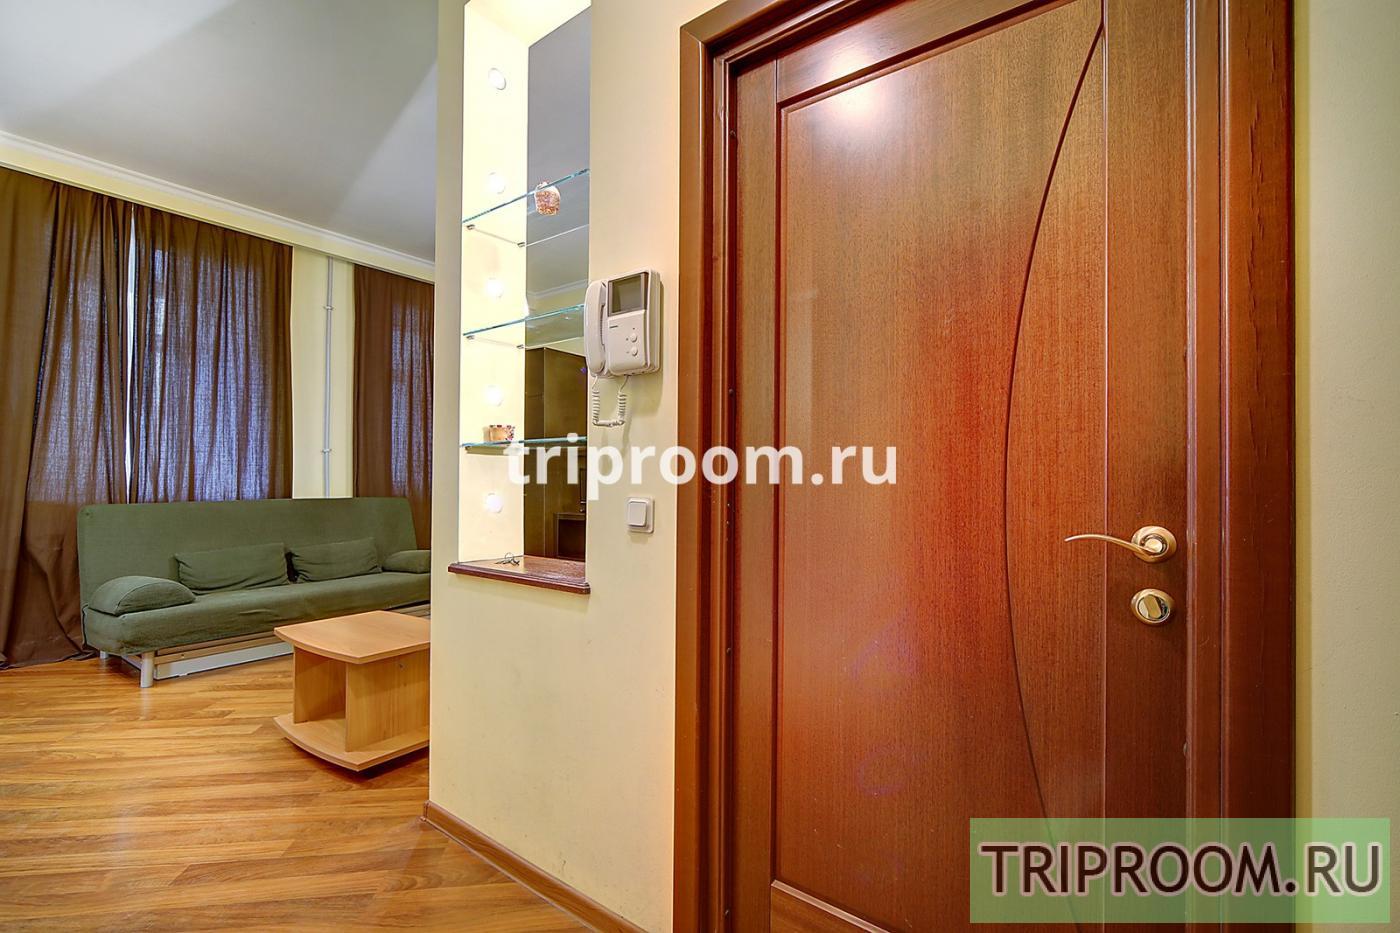 1-комнатная квартира посуточно (вариант № 15117), ул. Канала Грибоедова набережная, фото № 15